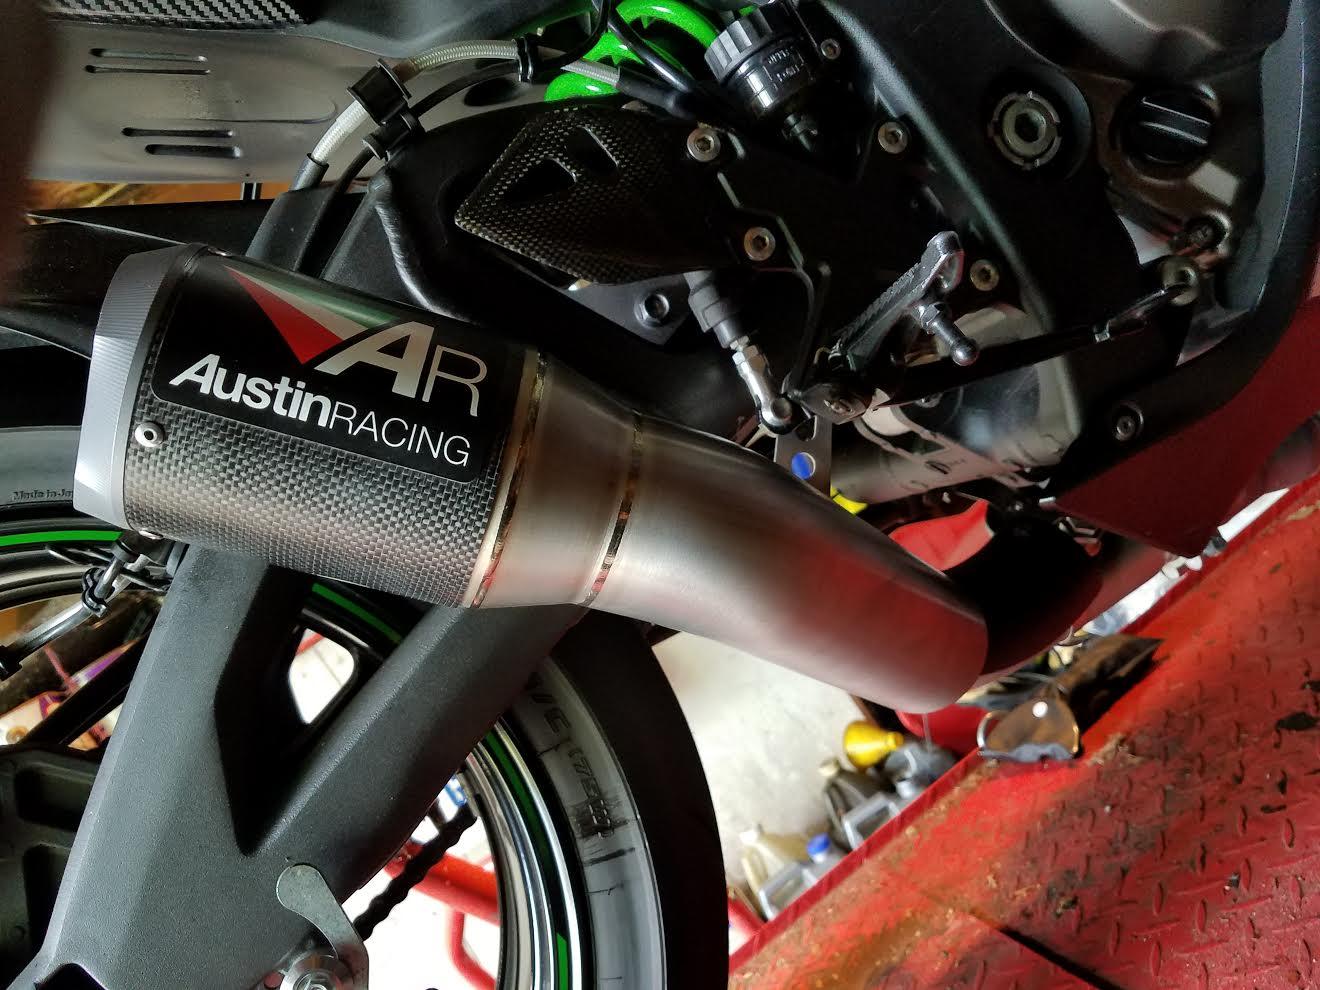 Gen 5 2016 Austin Racing Gp1r Exhaust It Is Loud Kawasaki Zx 10r Forum